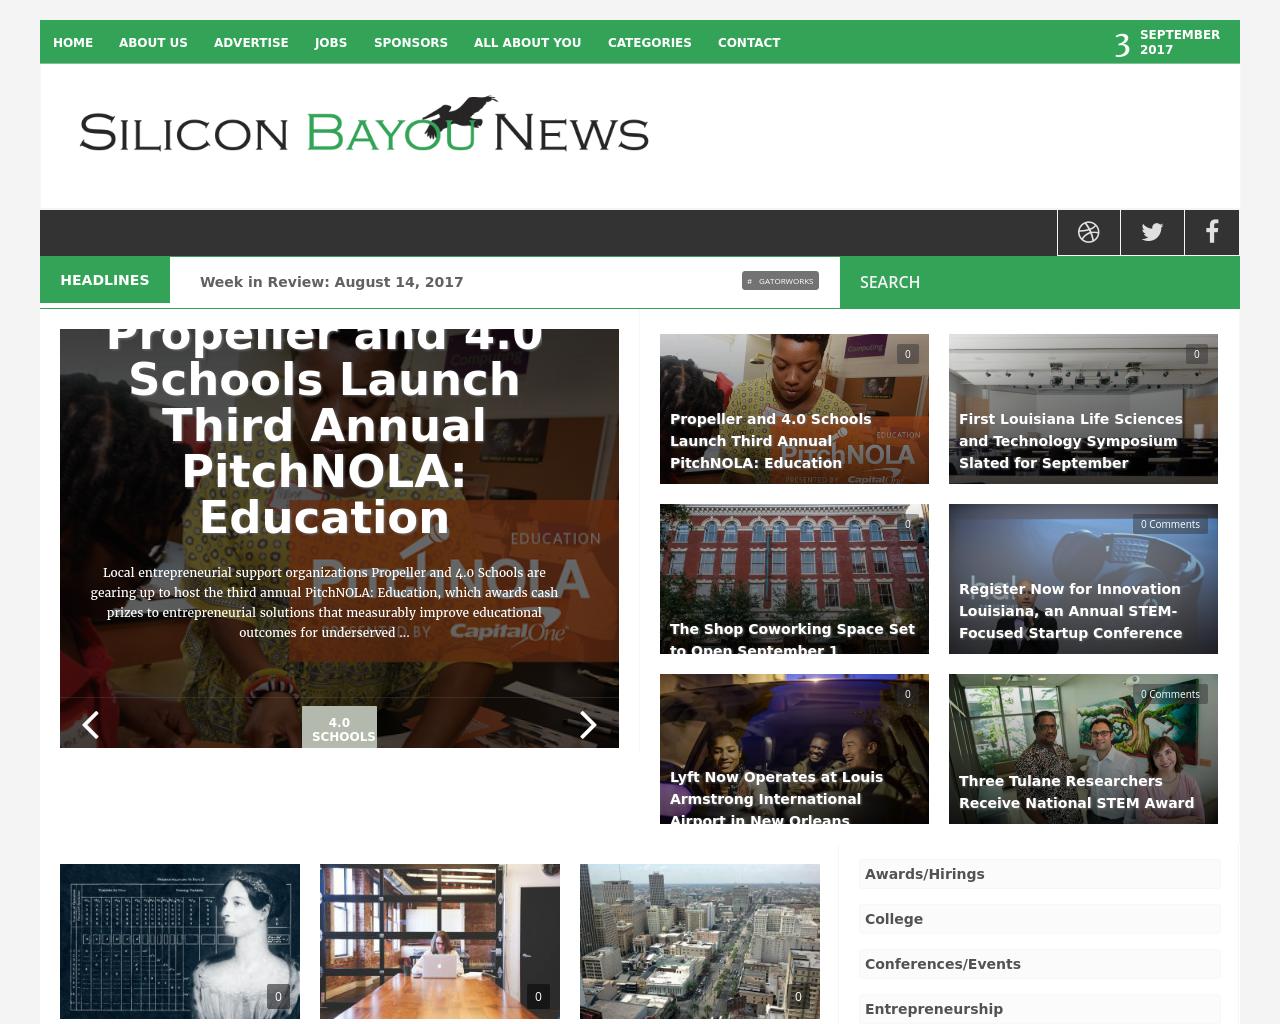 Silicon-Bayou-News-Advertising-Reviews-Pricing